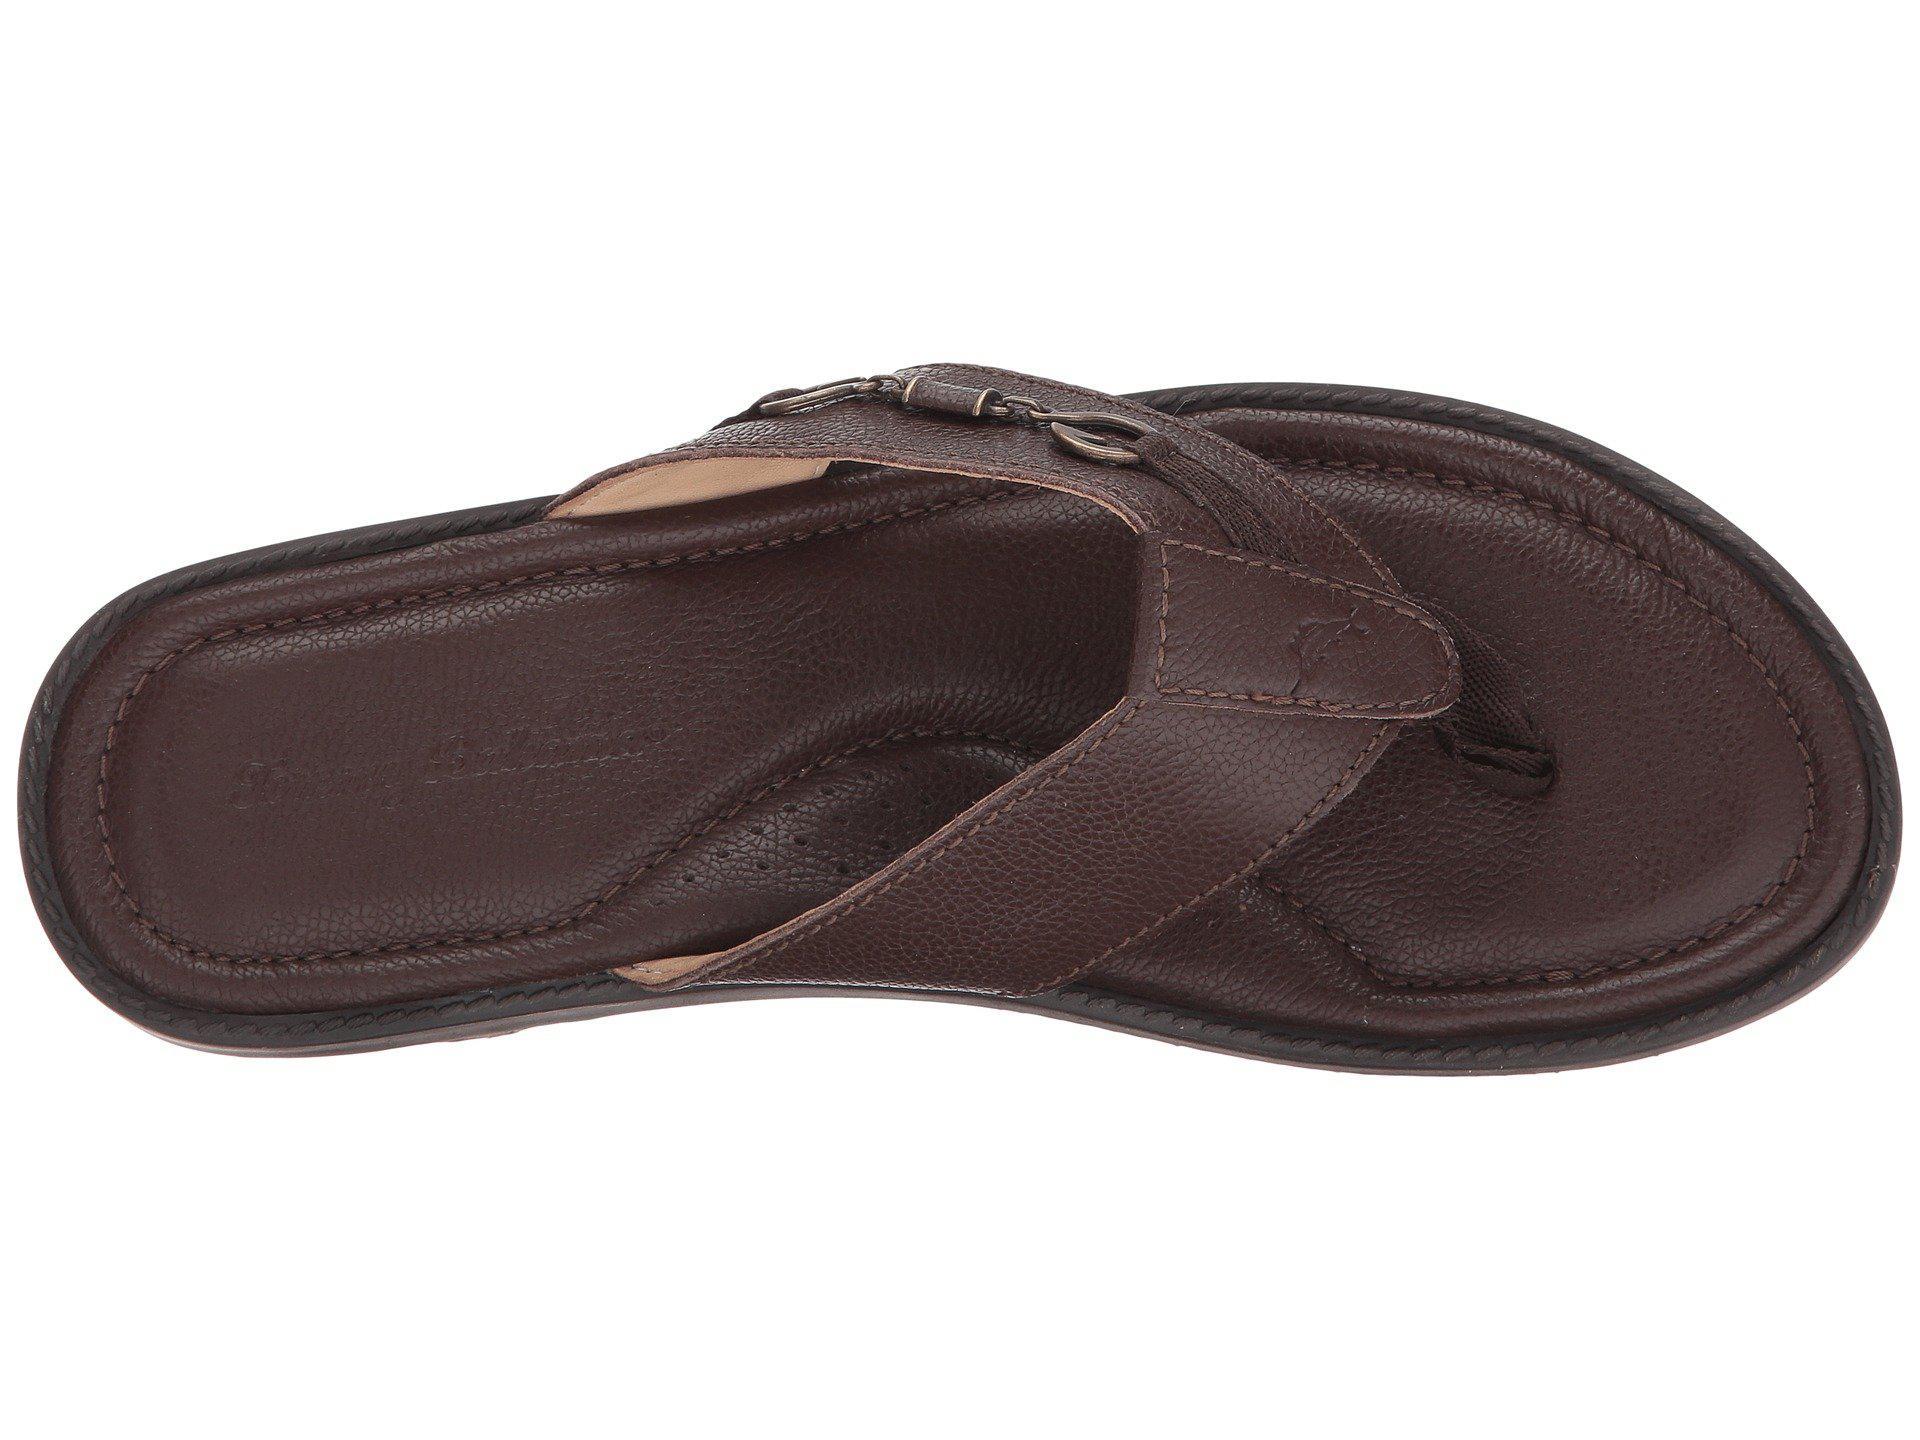 8f5c8ca85c67d Tommy Bahama - Brown Belize Vintage (black) Men s Sandals for Men - Lyst.  View fullscreen